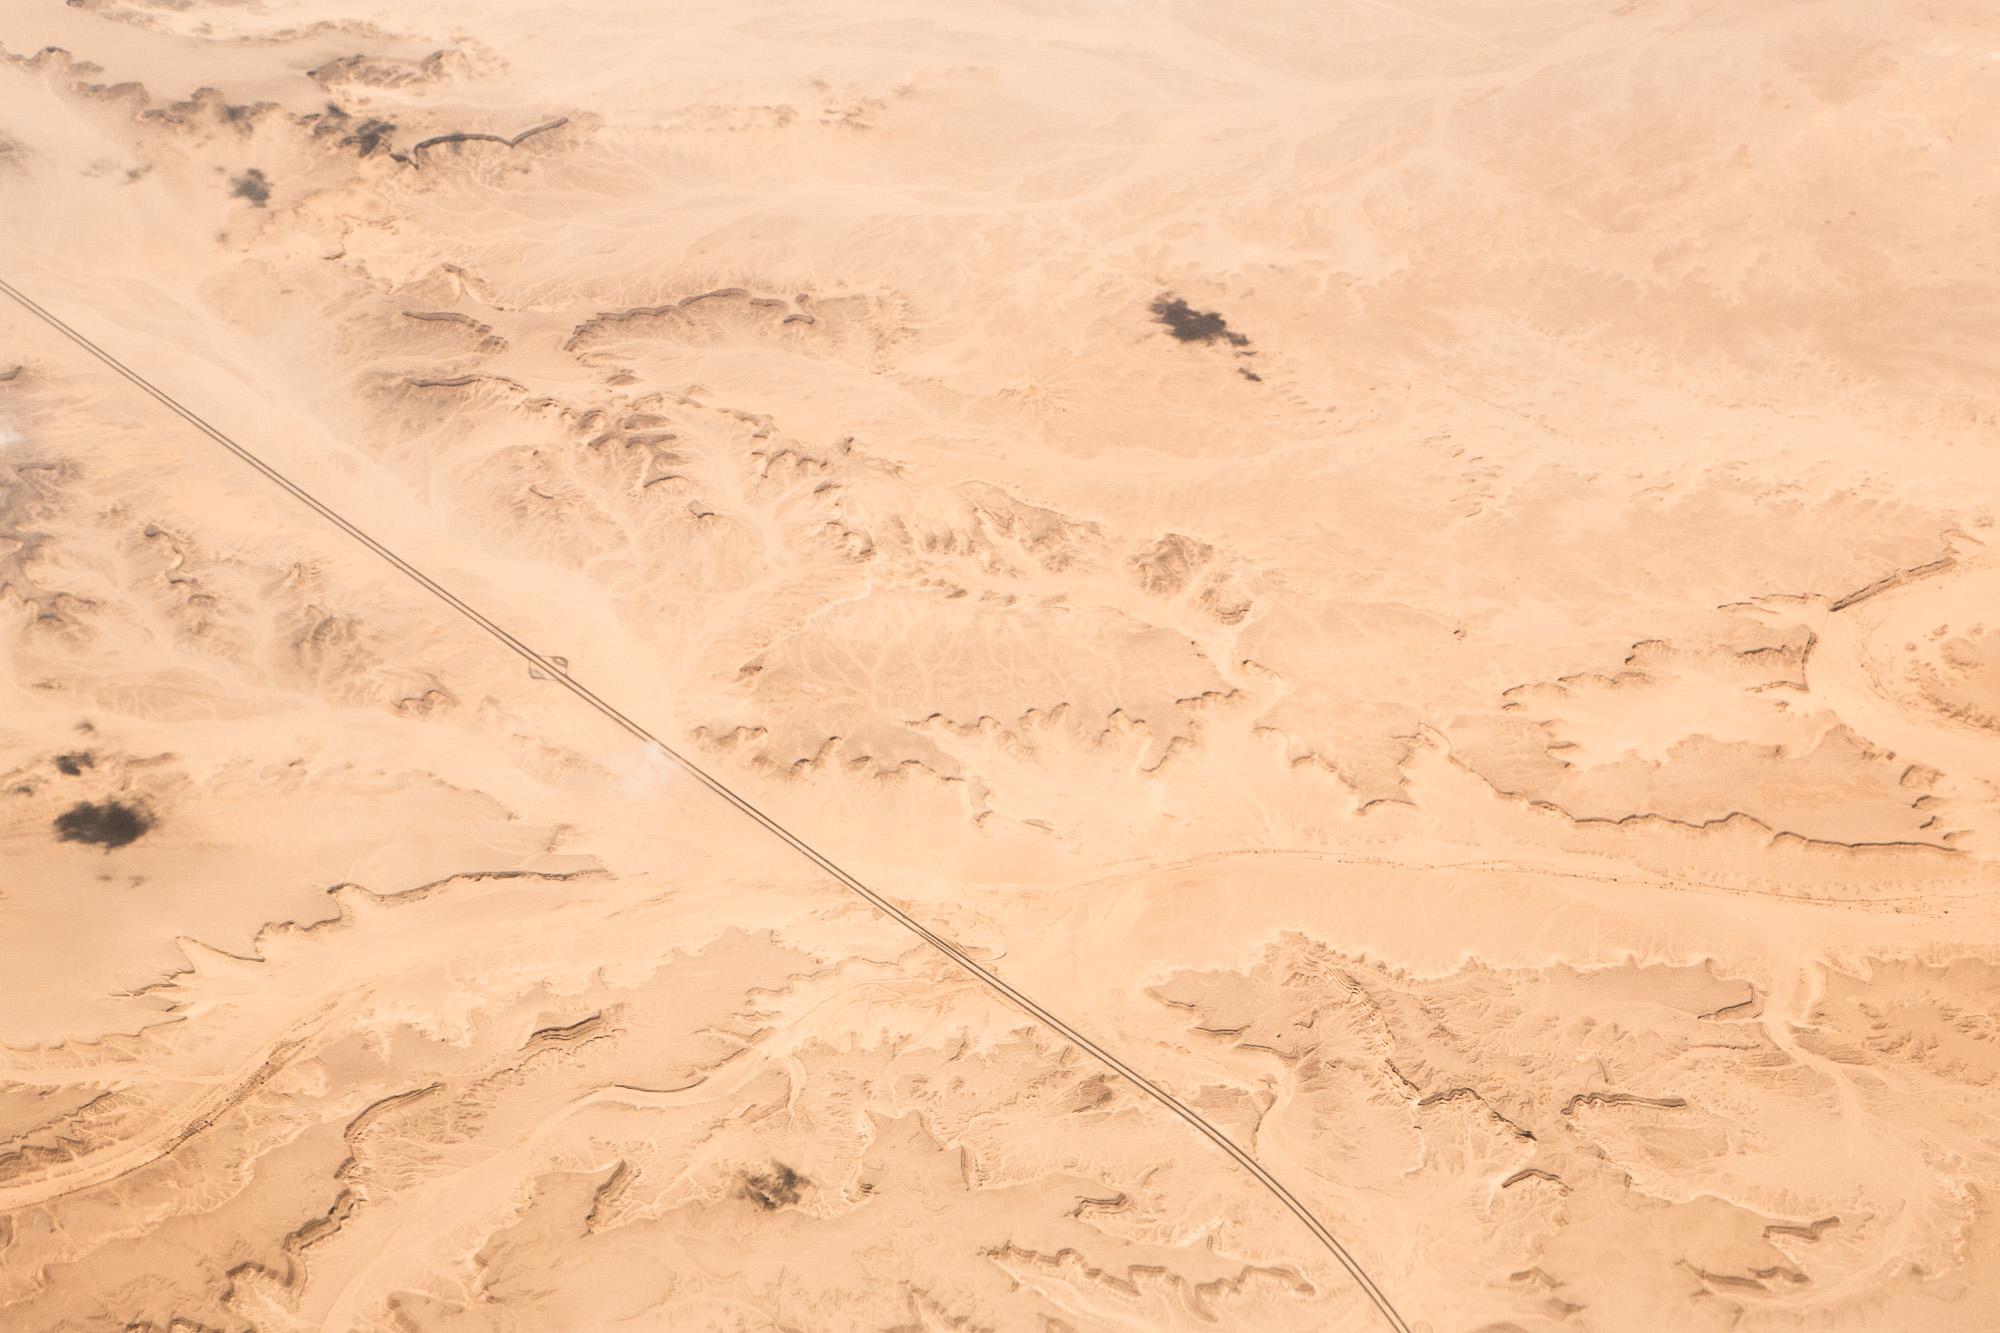 Deserts - Survey #1, 2015